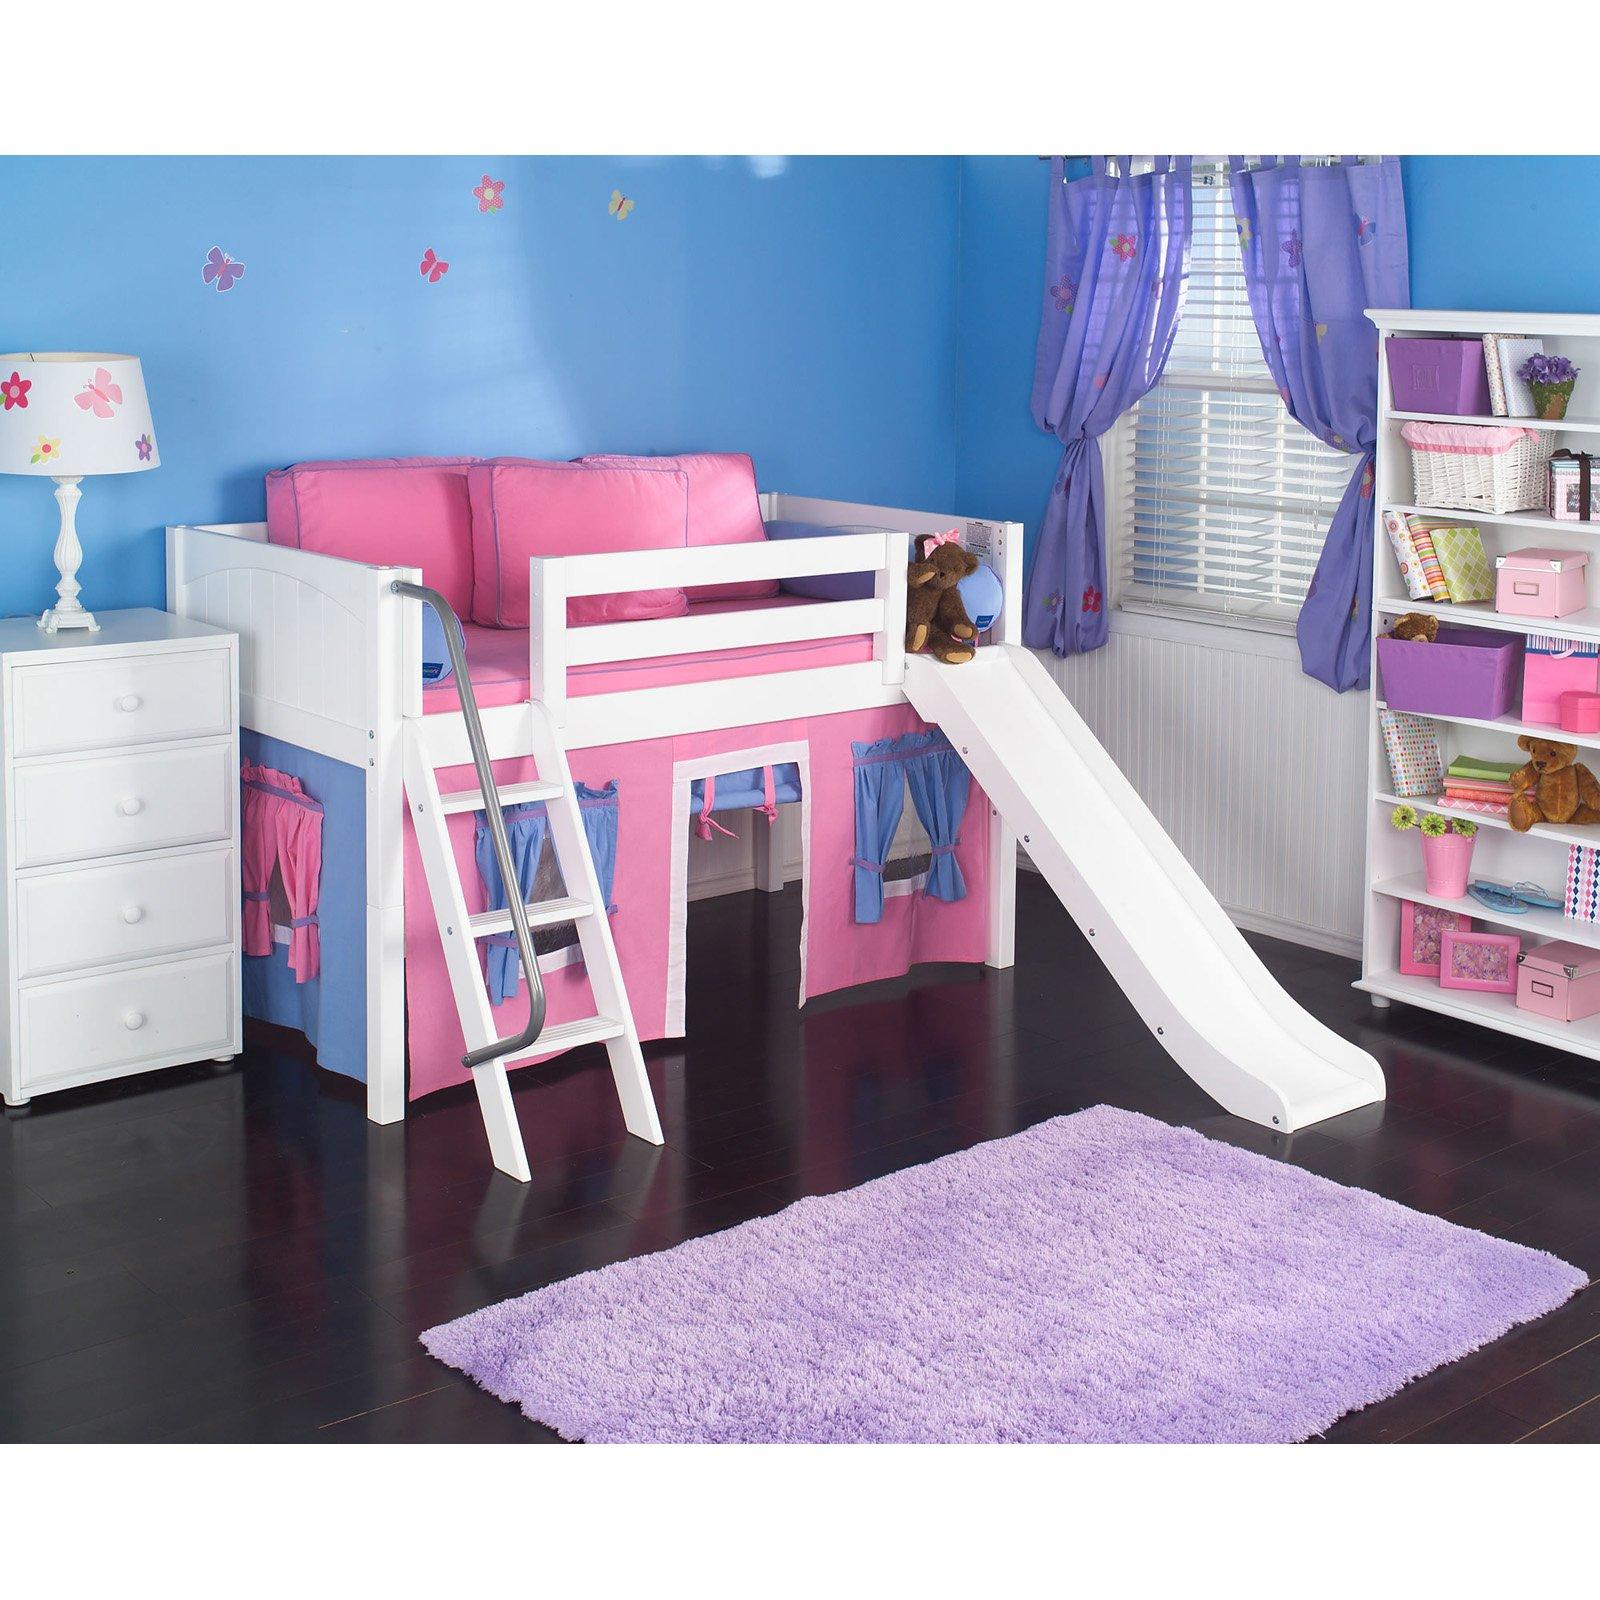 Girls loft bed with slide - Girls Loft Bed With Slide 7